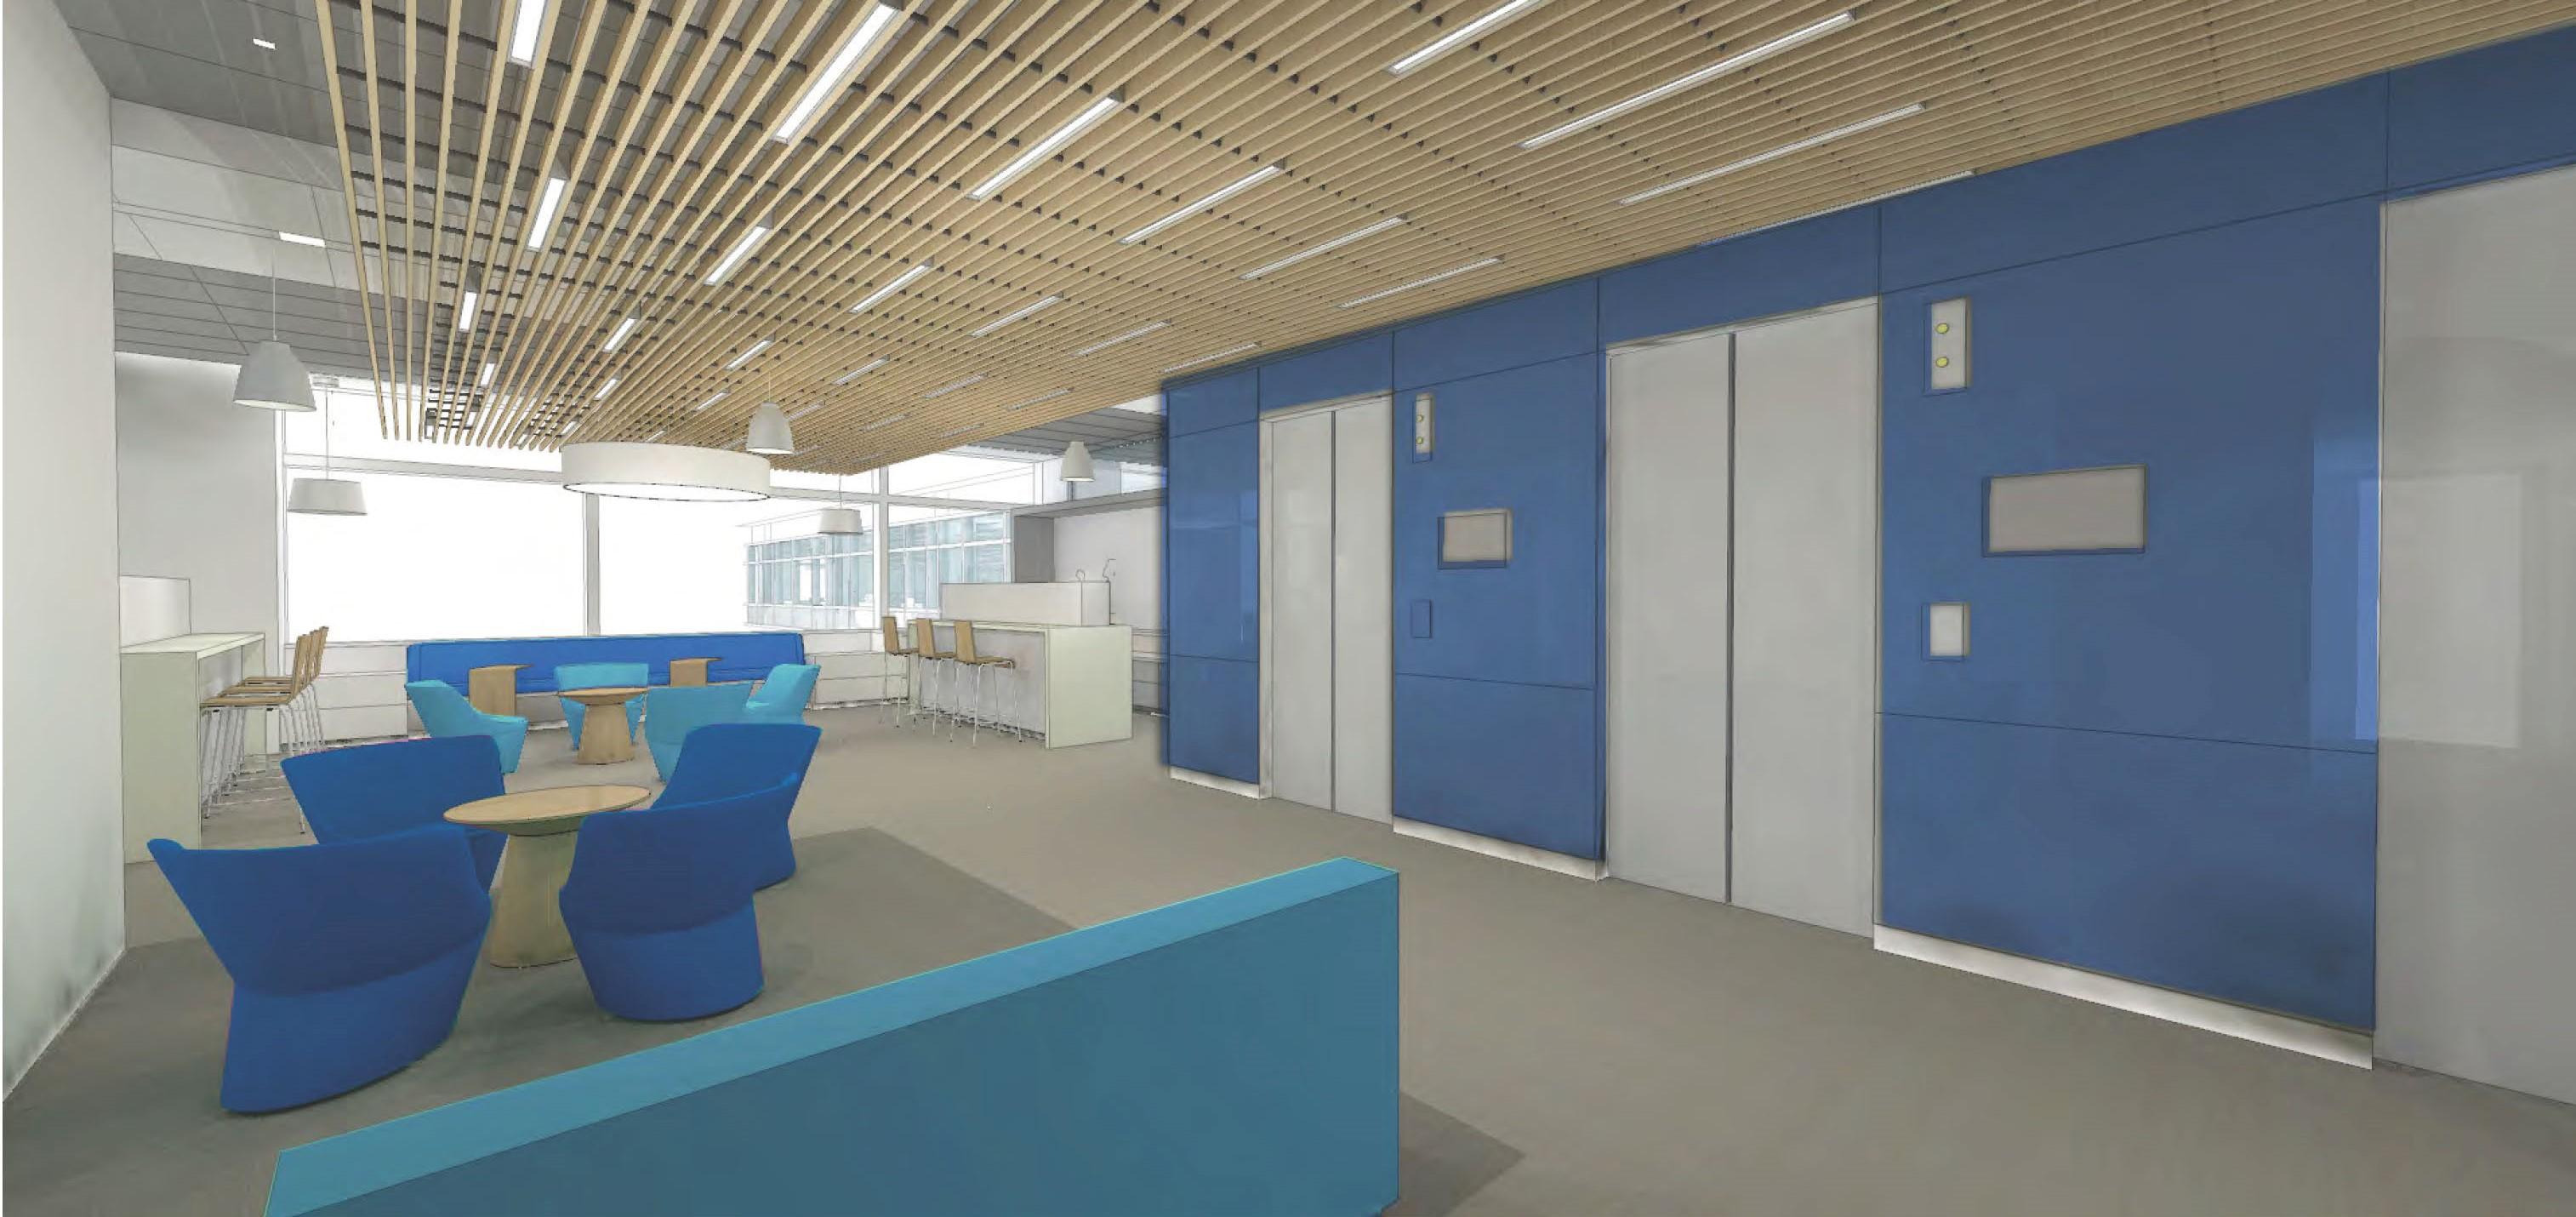 Office Lab Interior Rendering 3